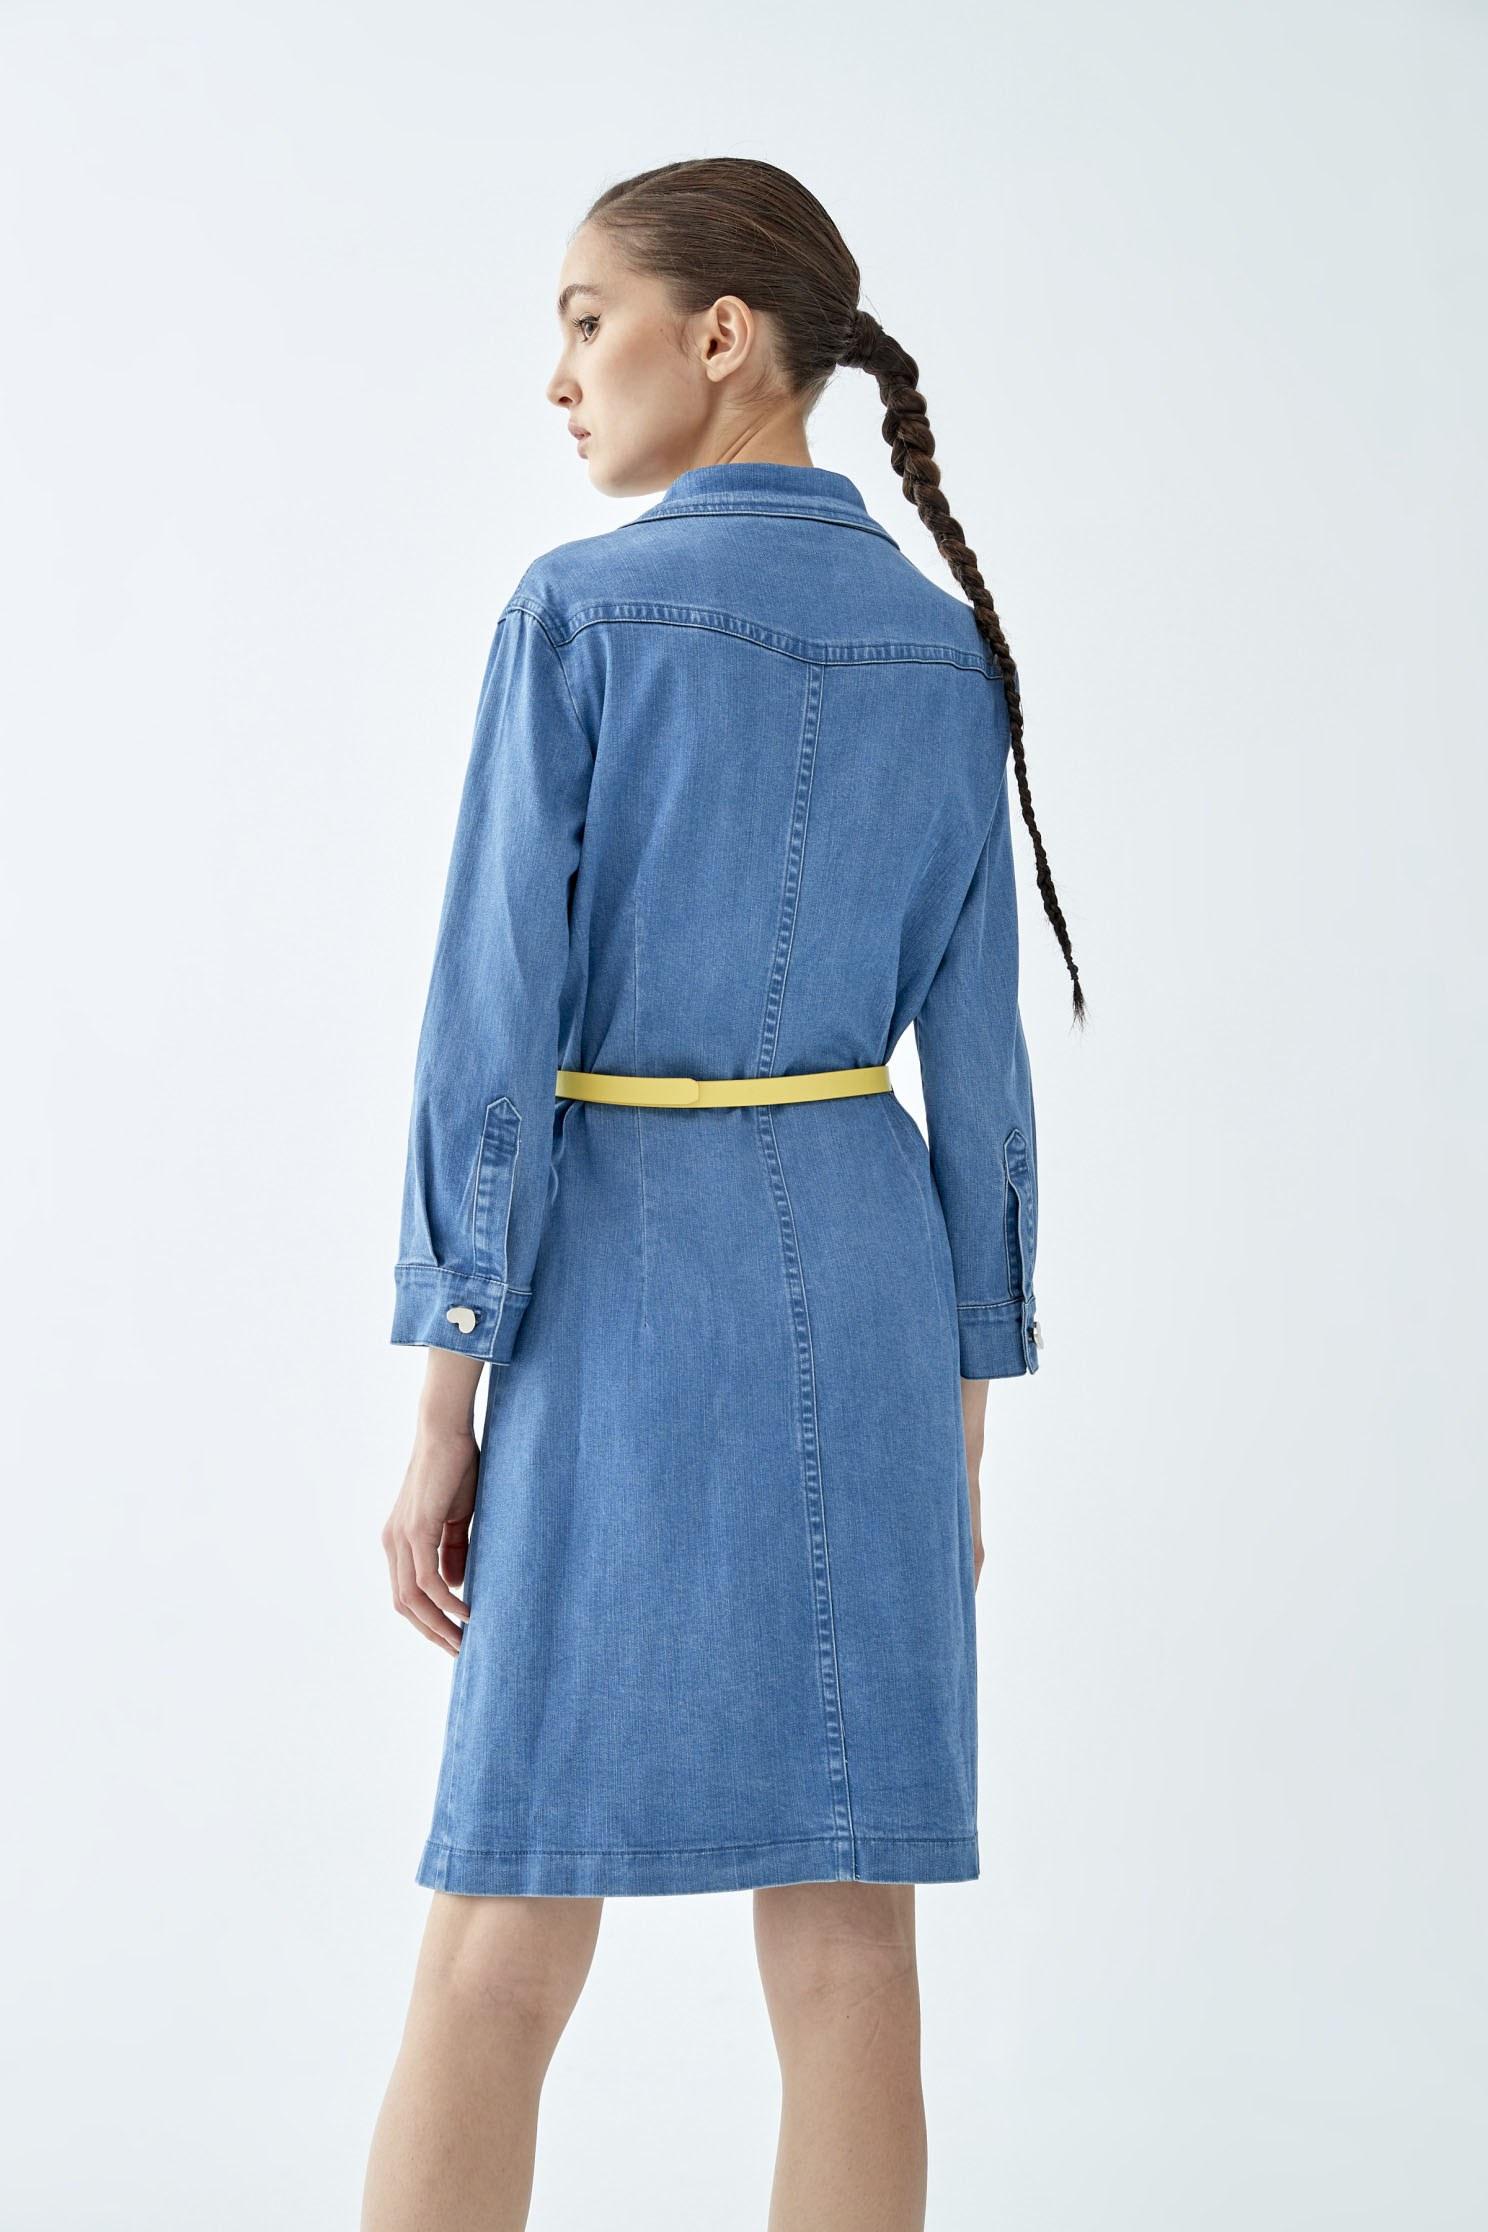 Denim shirt-style dress with love buttons,Rayon,Season (SS) Look,Denim,Blouses